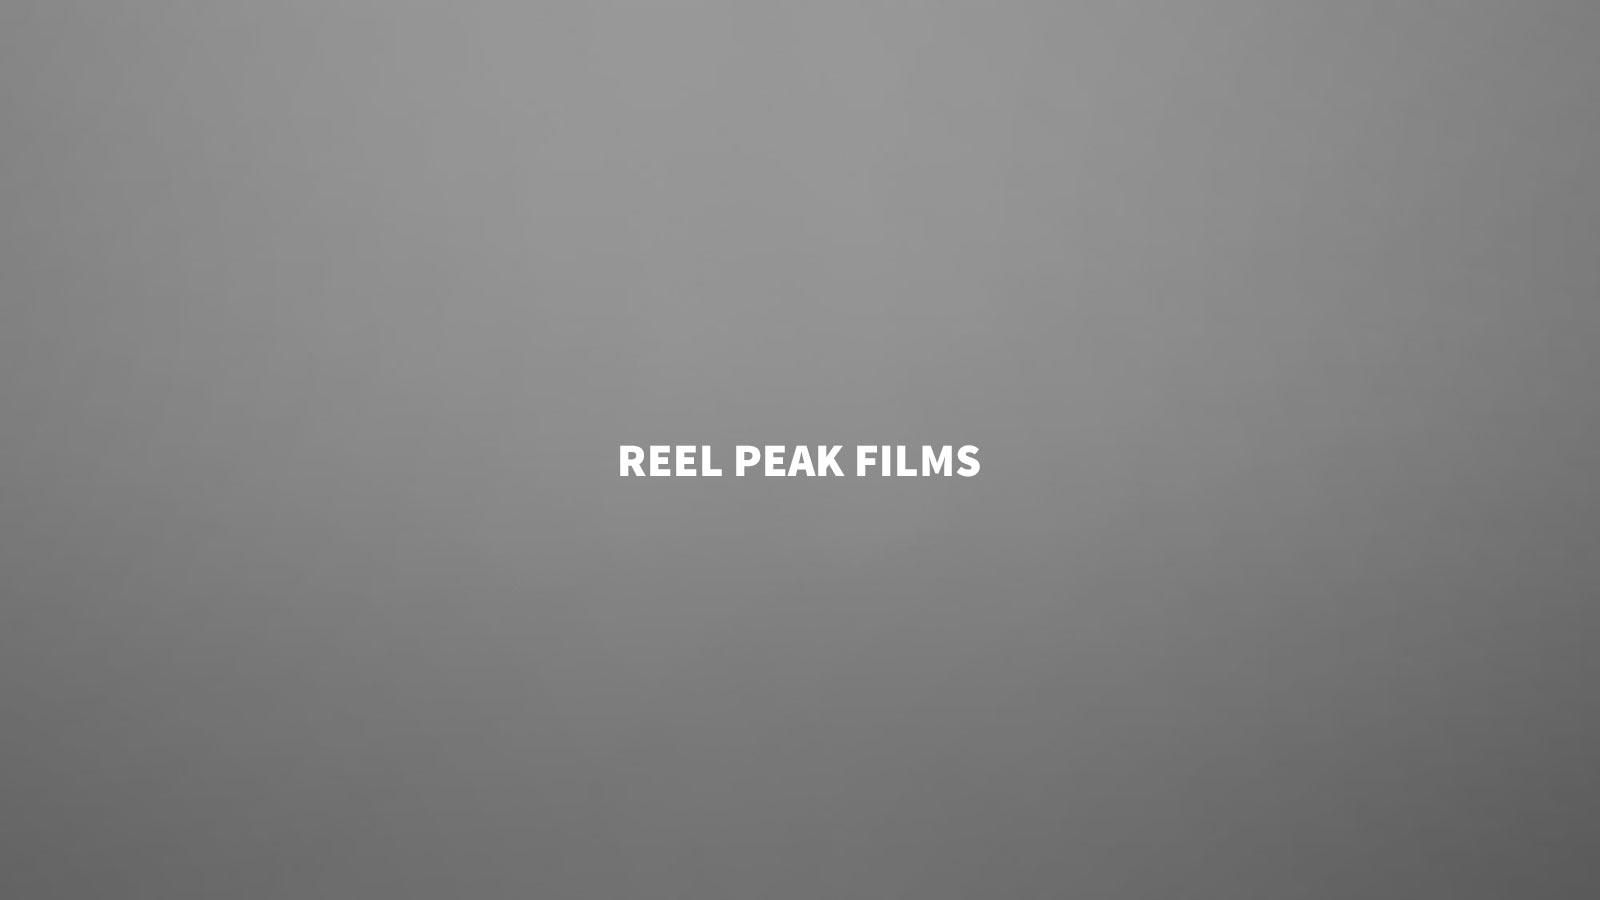 Trailer 2: The Sequel